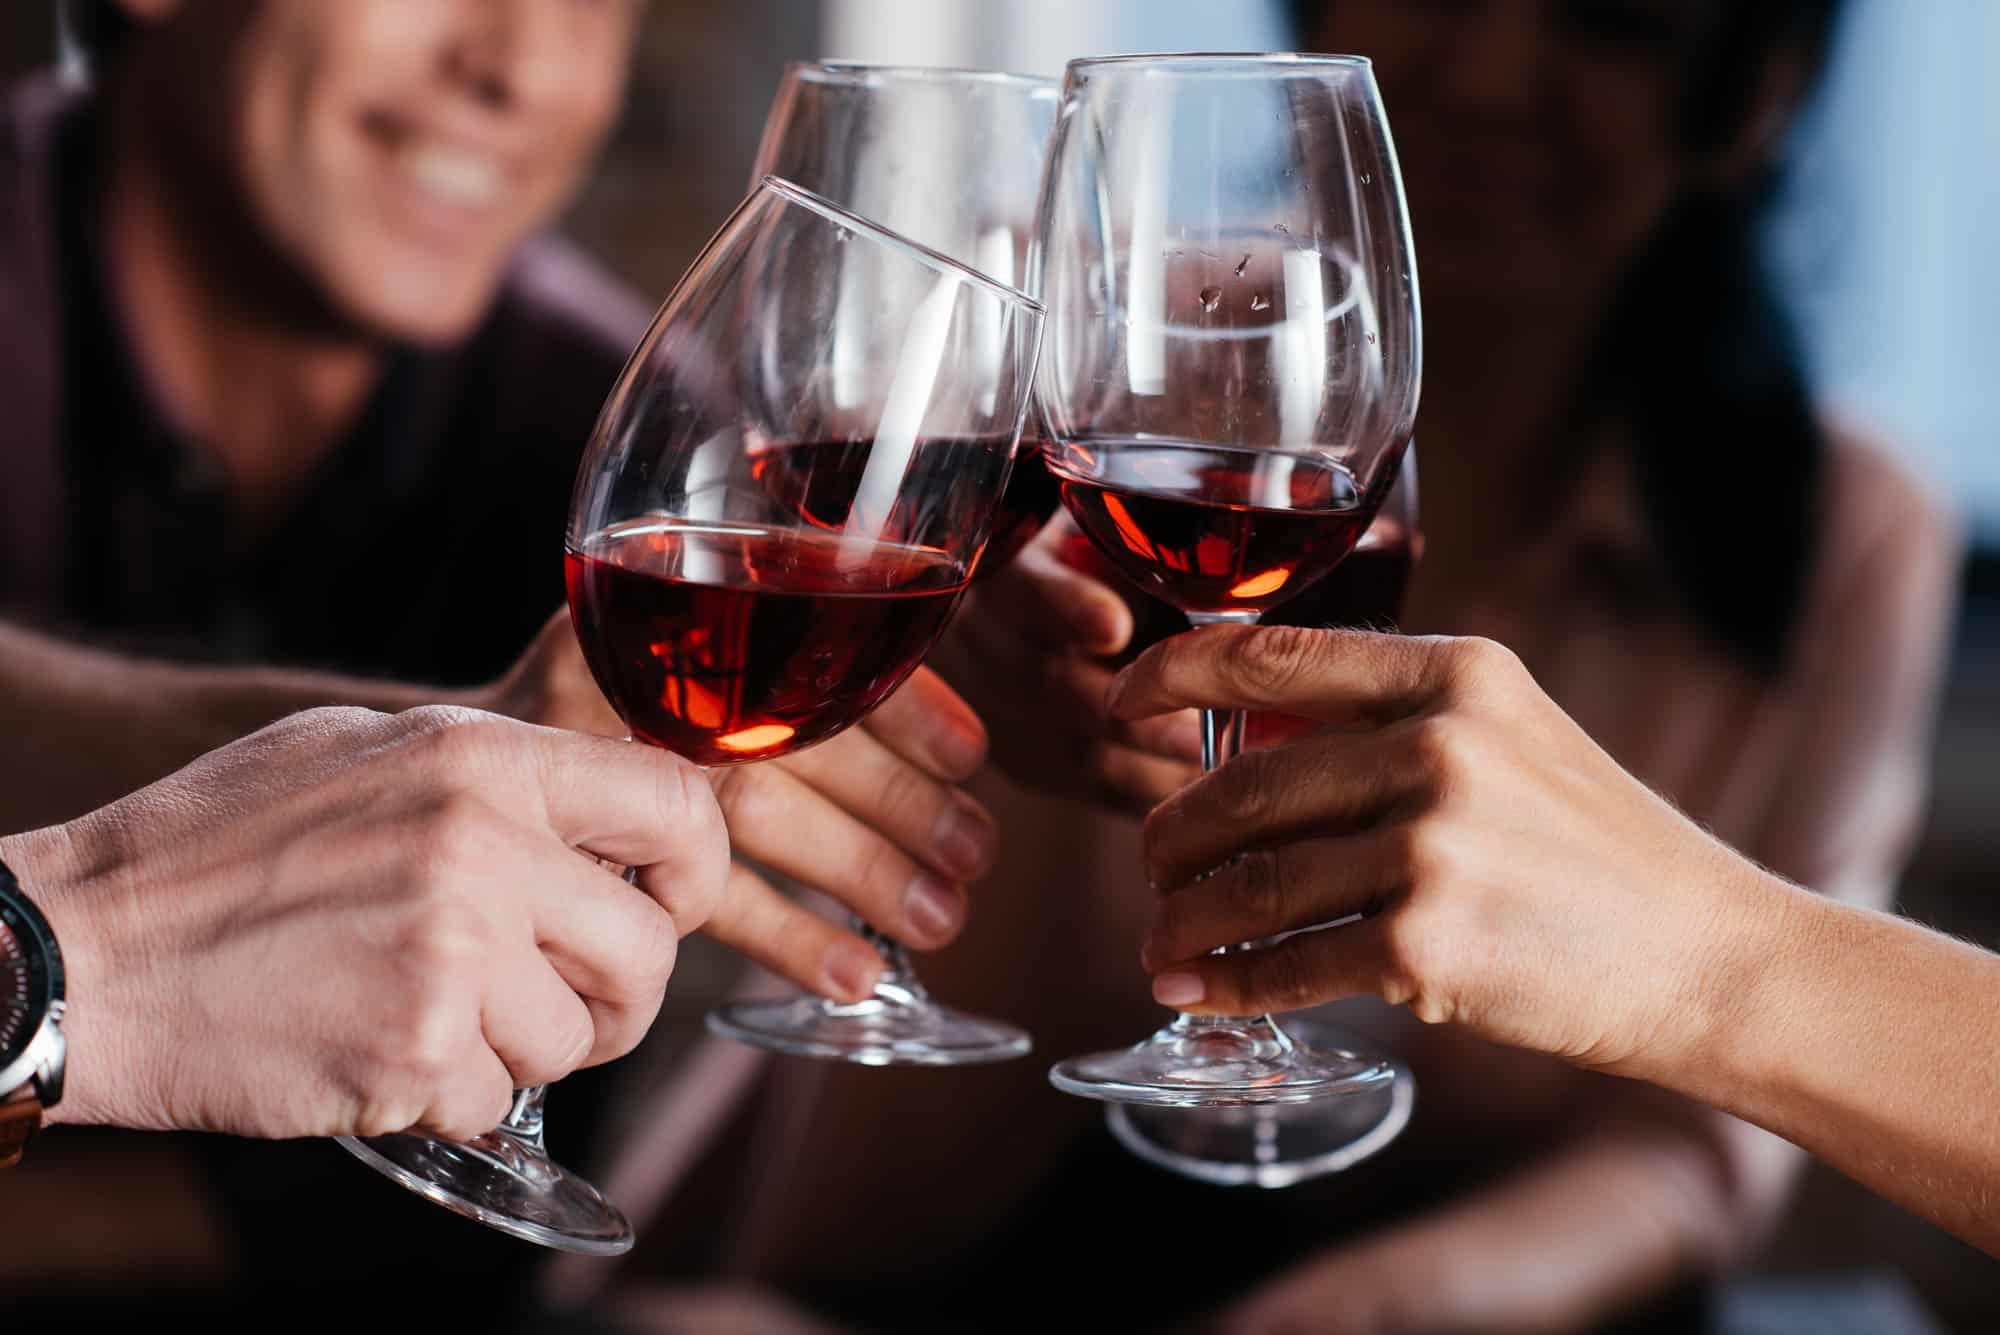 Friends clinging wine glasses